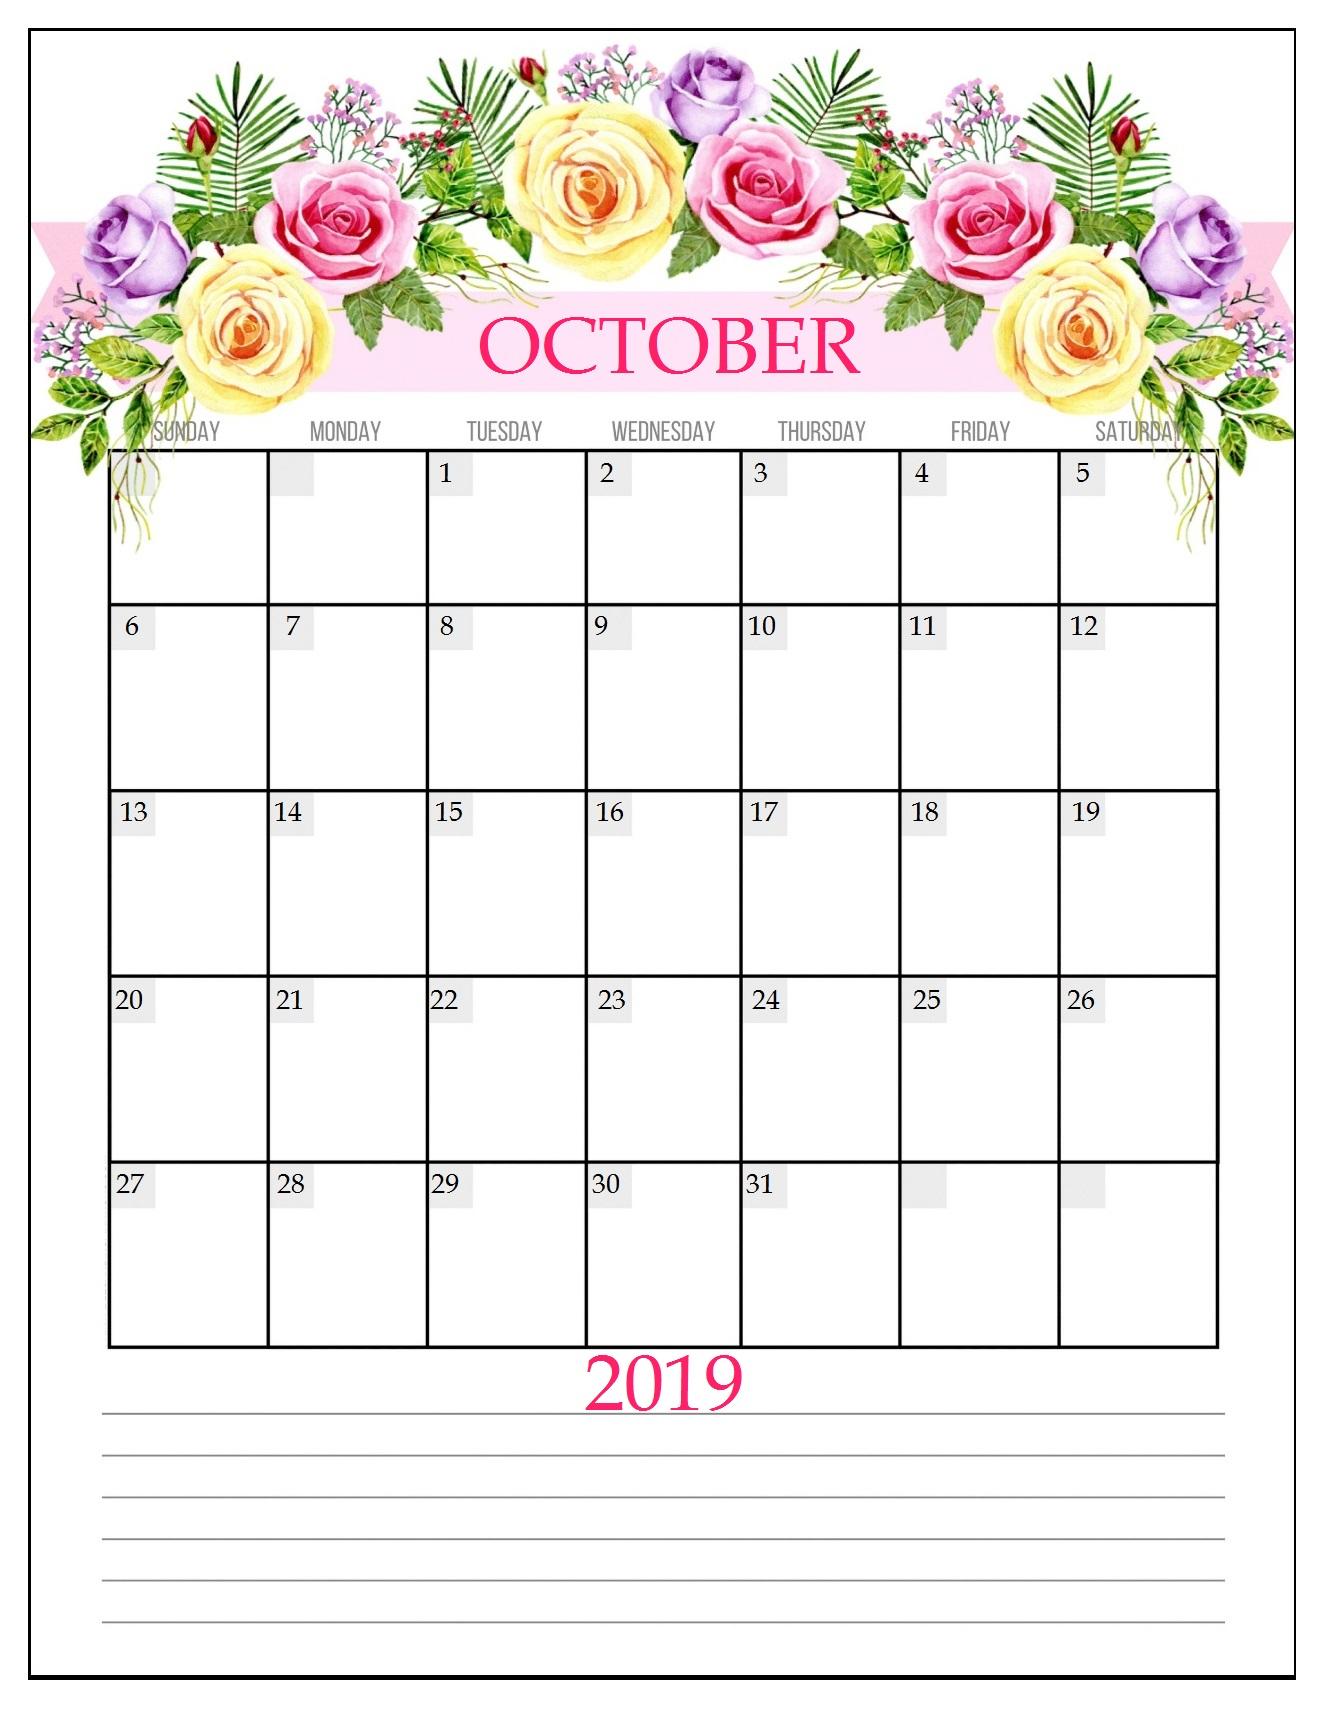 Printable October 2019 Floral Planner